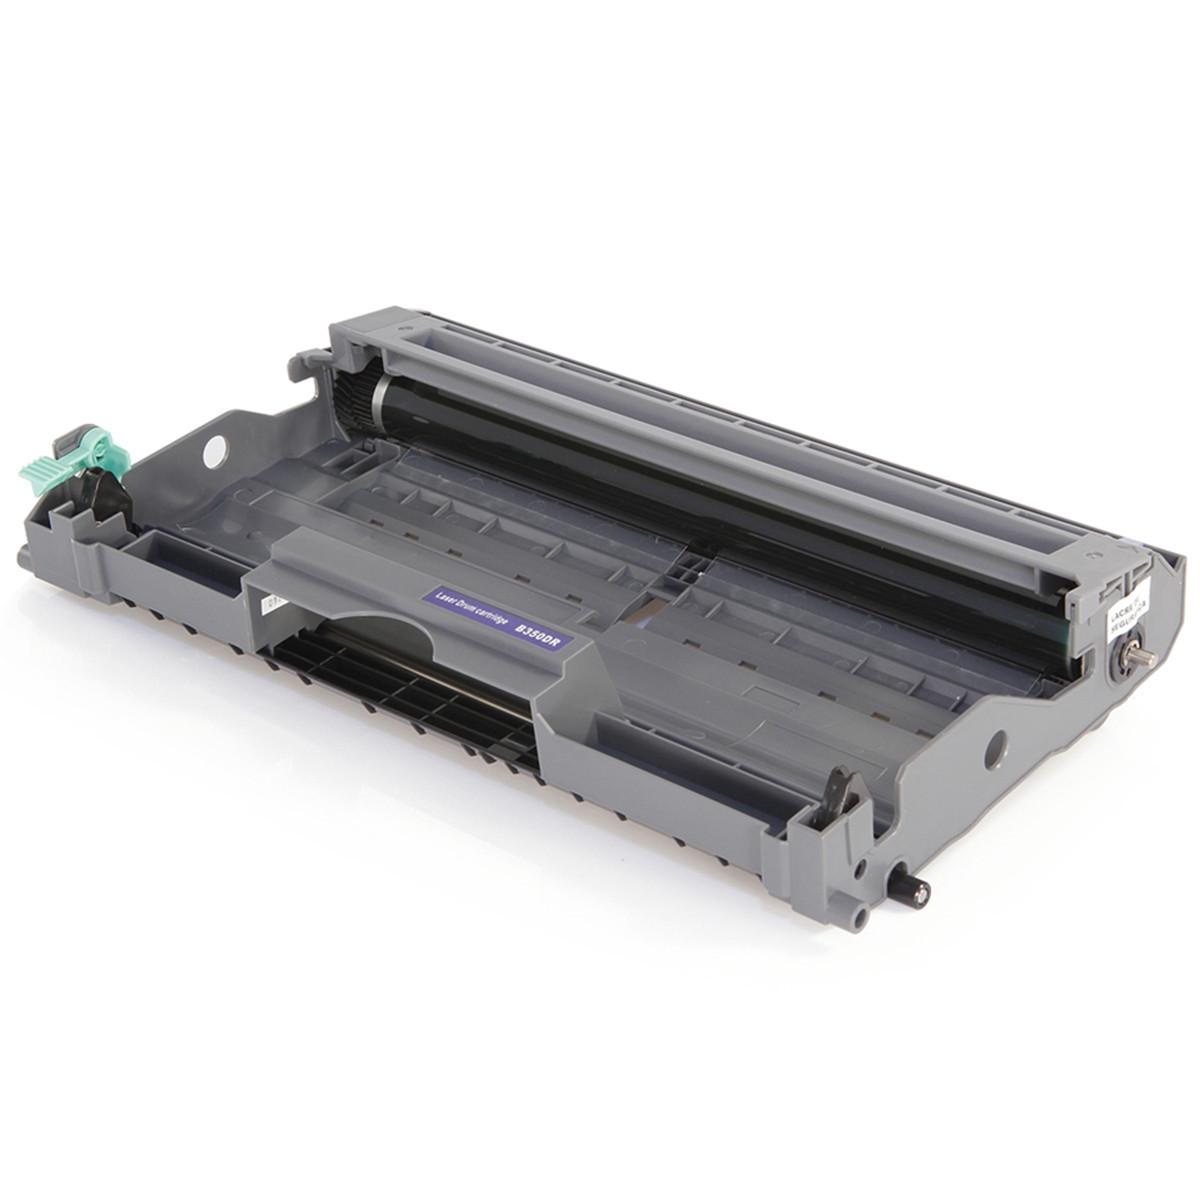 Cartucho de Cilindro Brother DR420 DR410 DR450 | TN420 TN410 TN450 HL2270DW HL2130 | Premium Quality